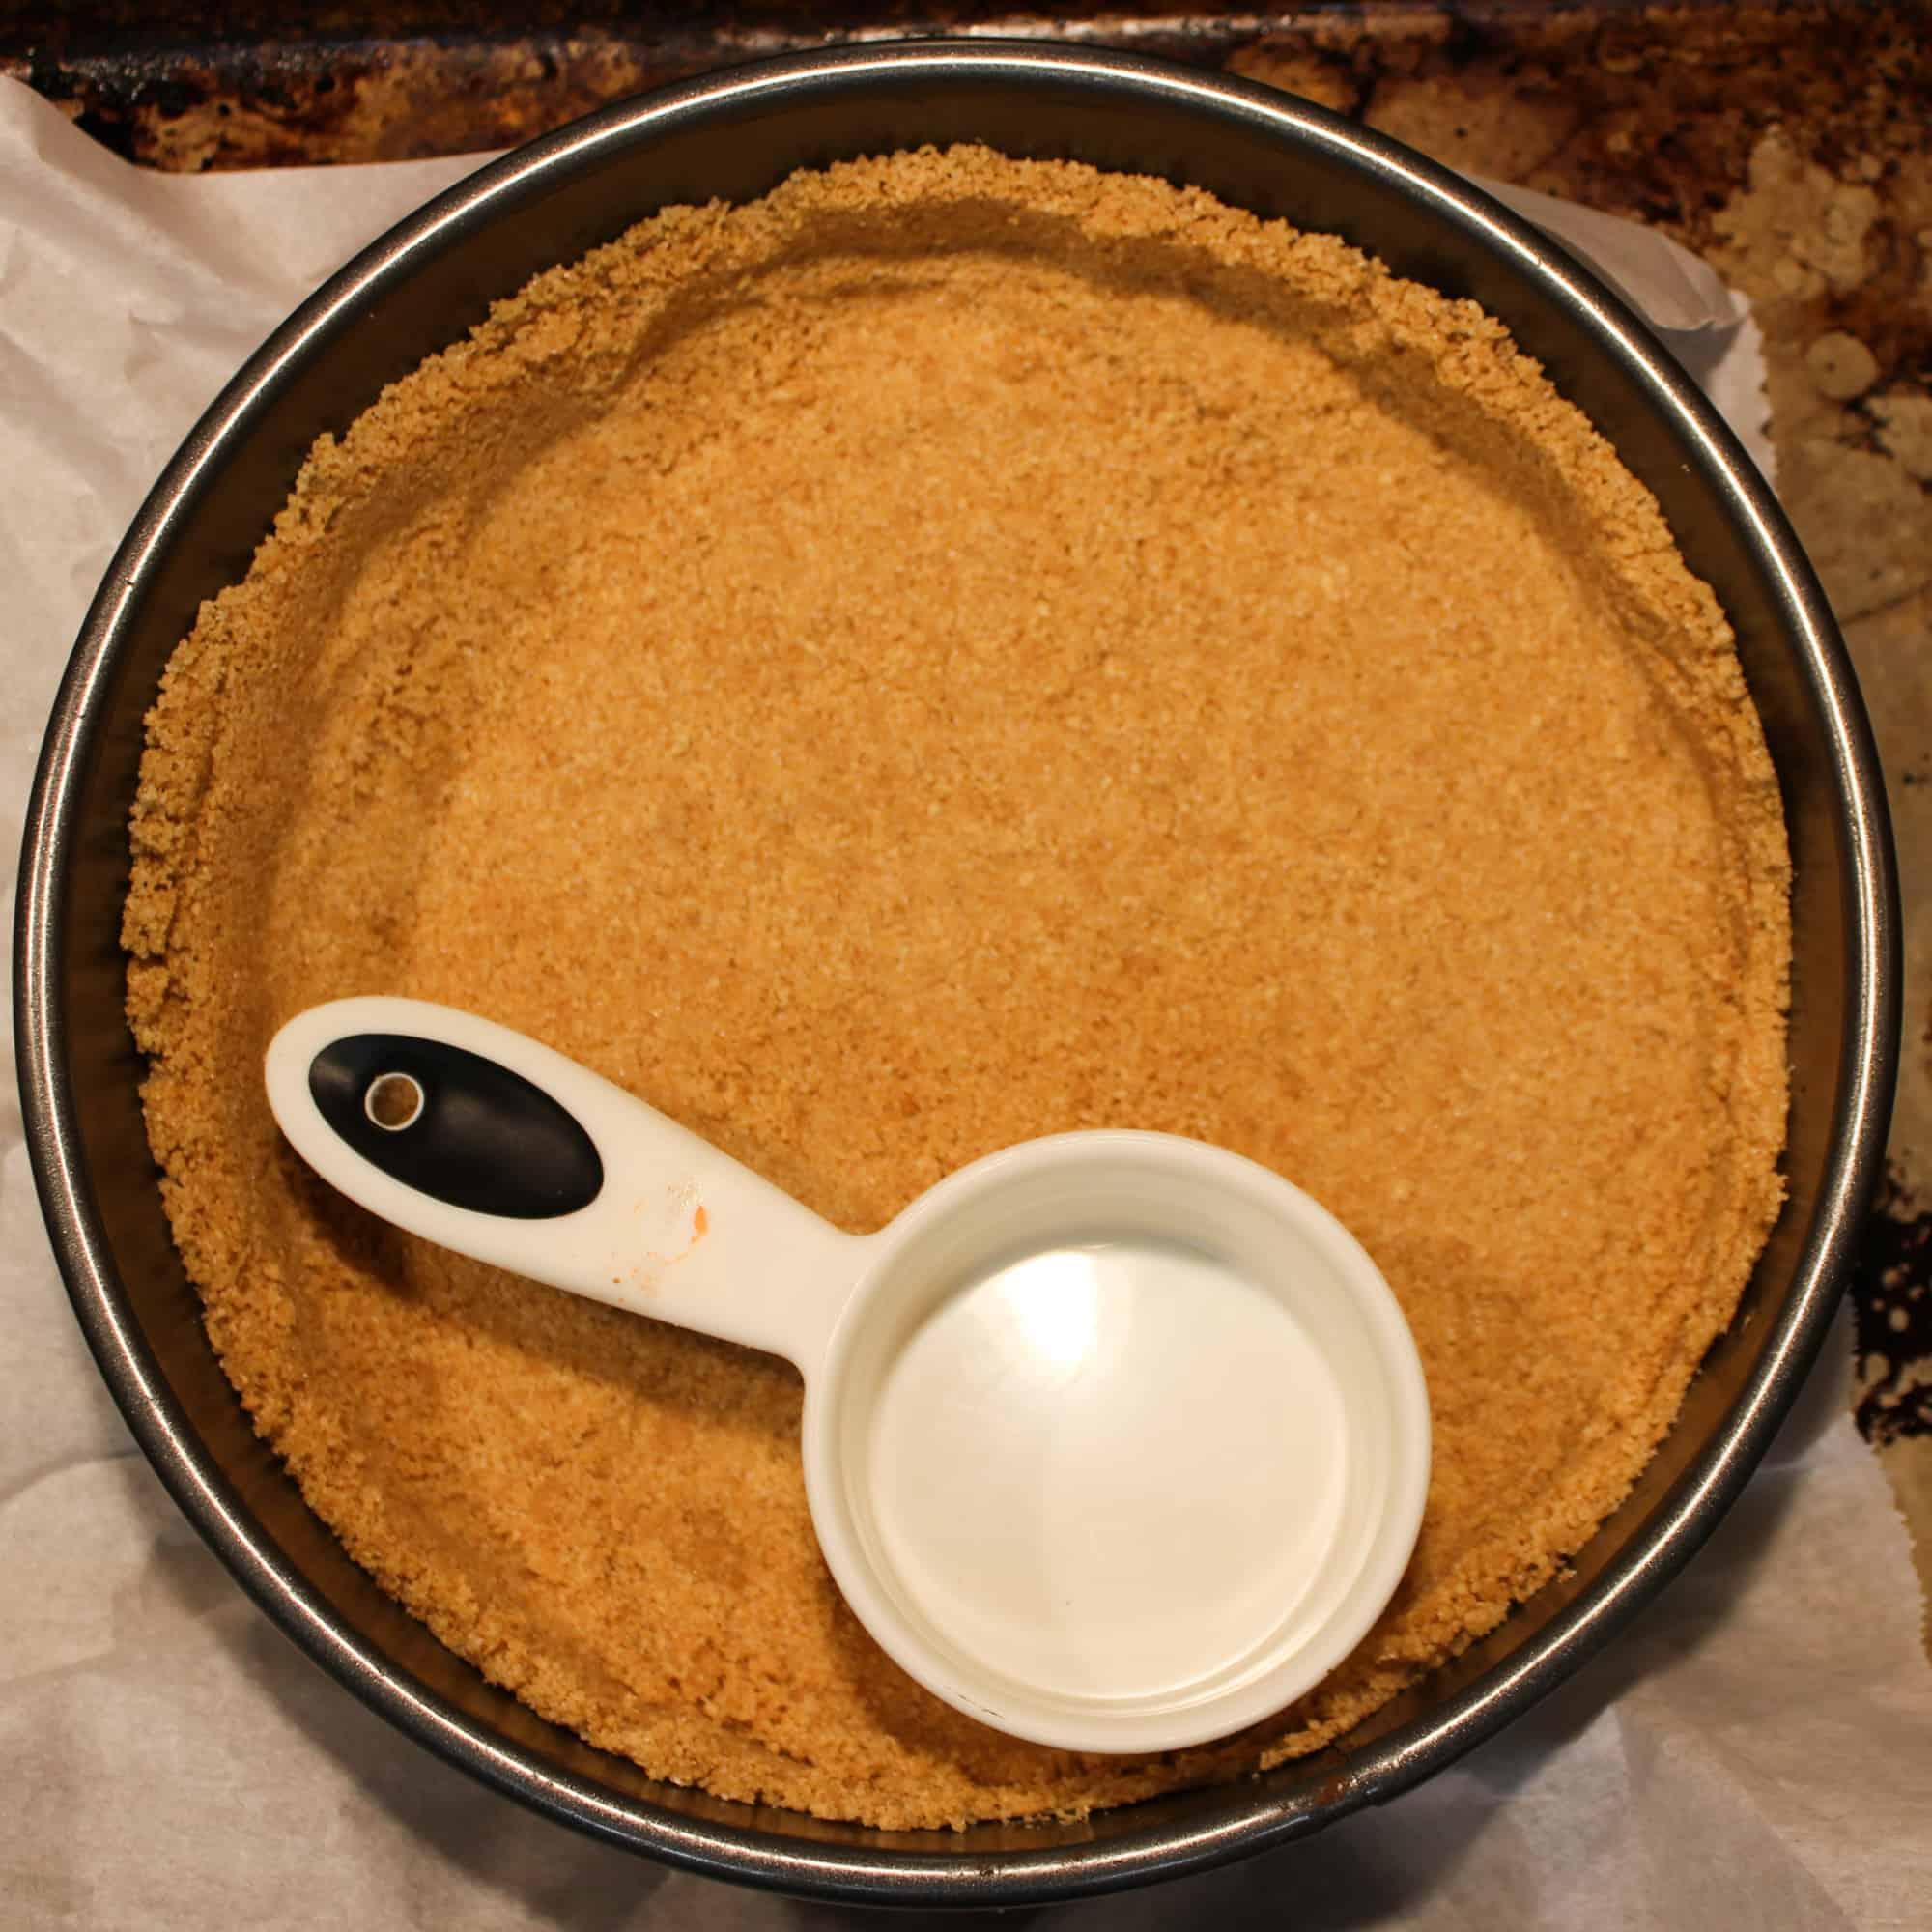 cheesecake crust in the pan